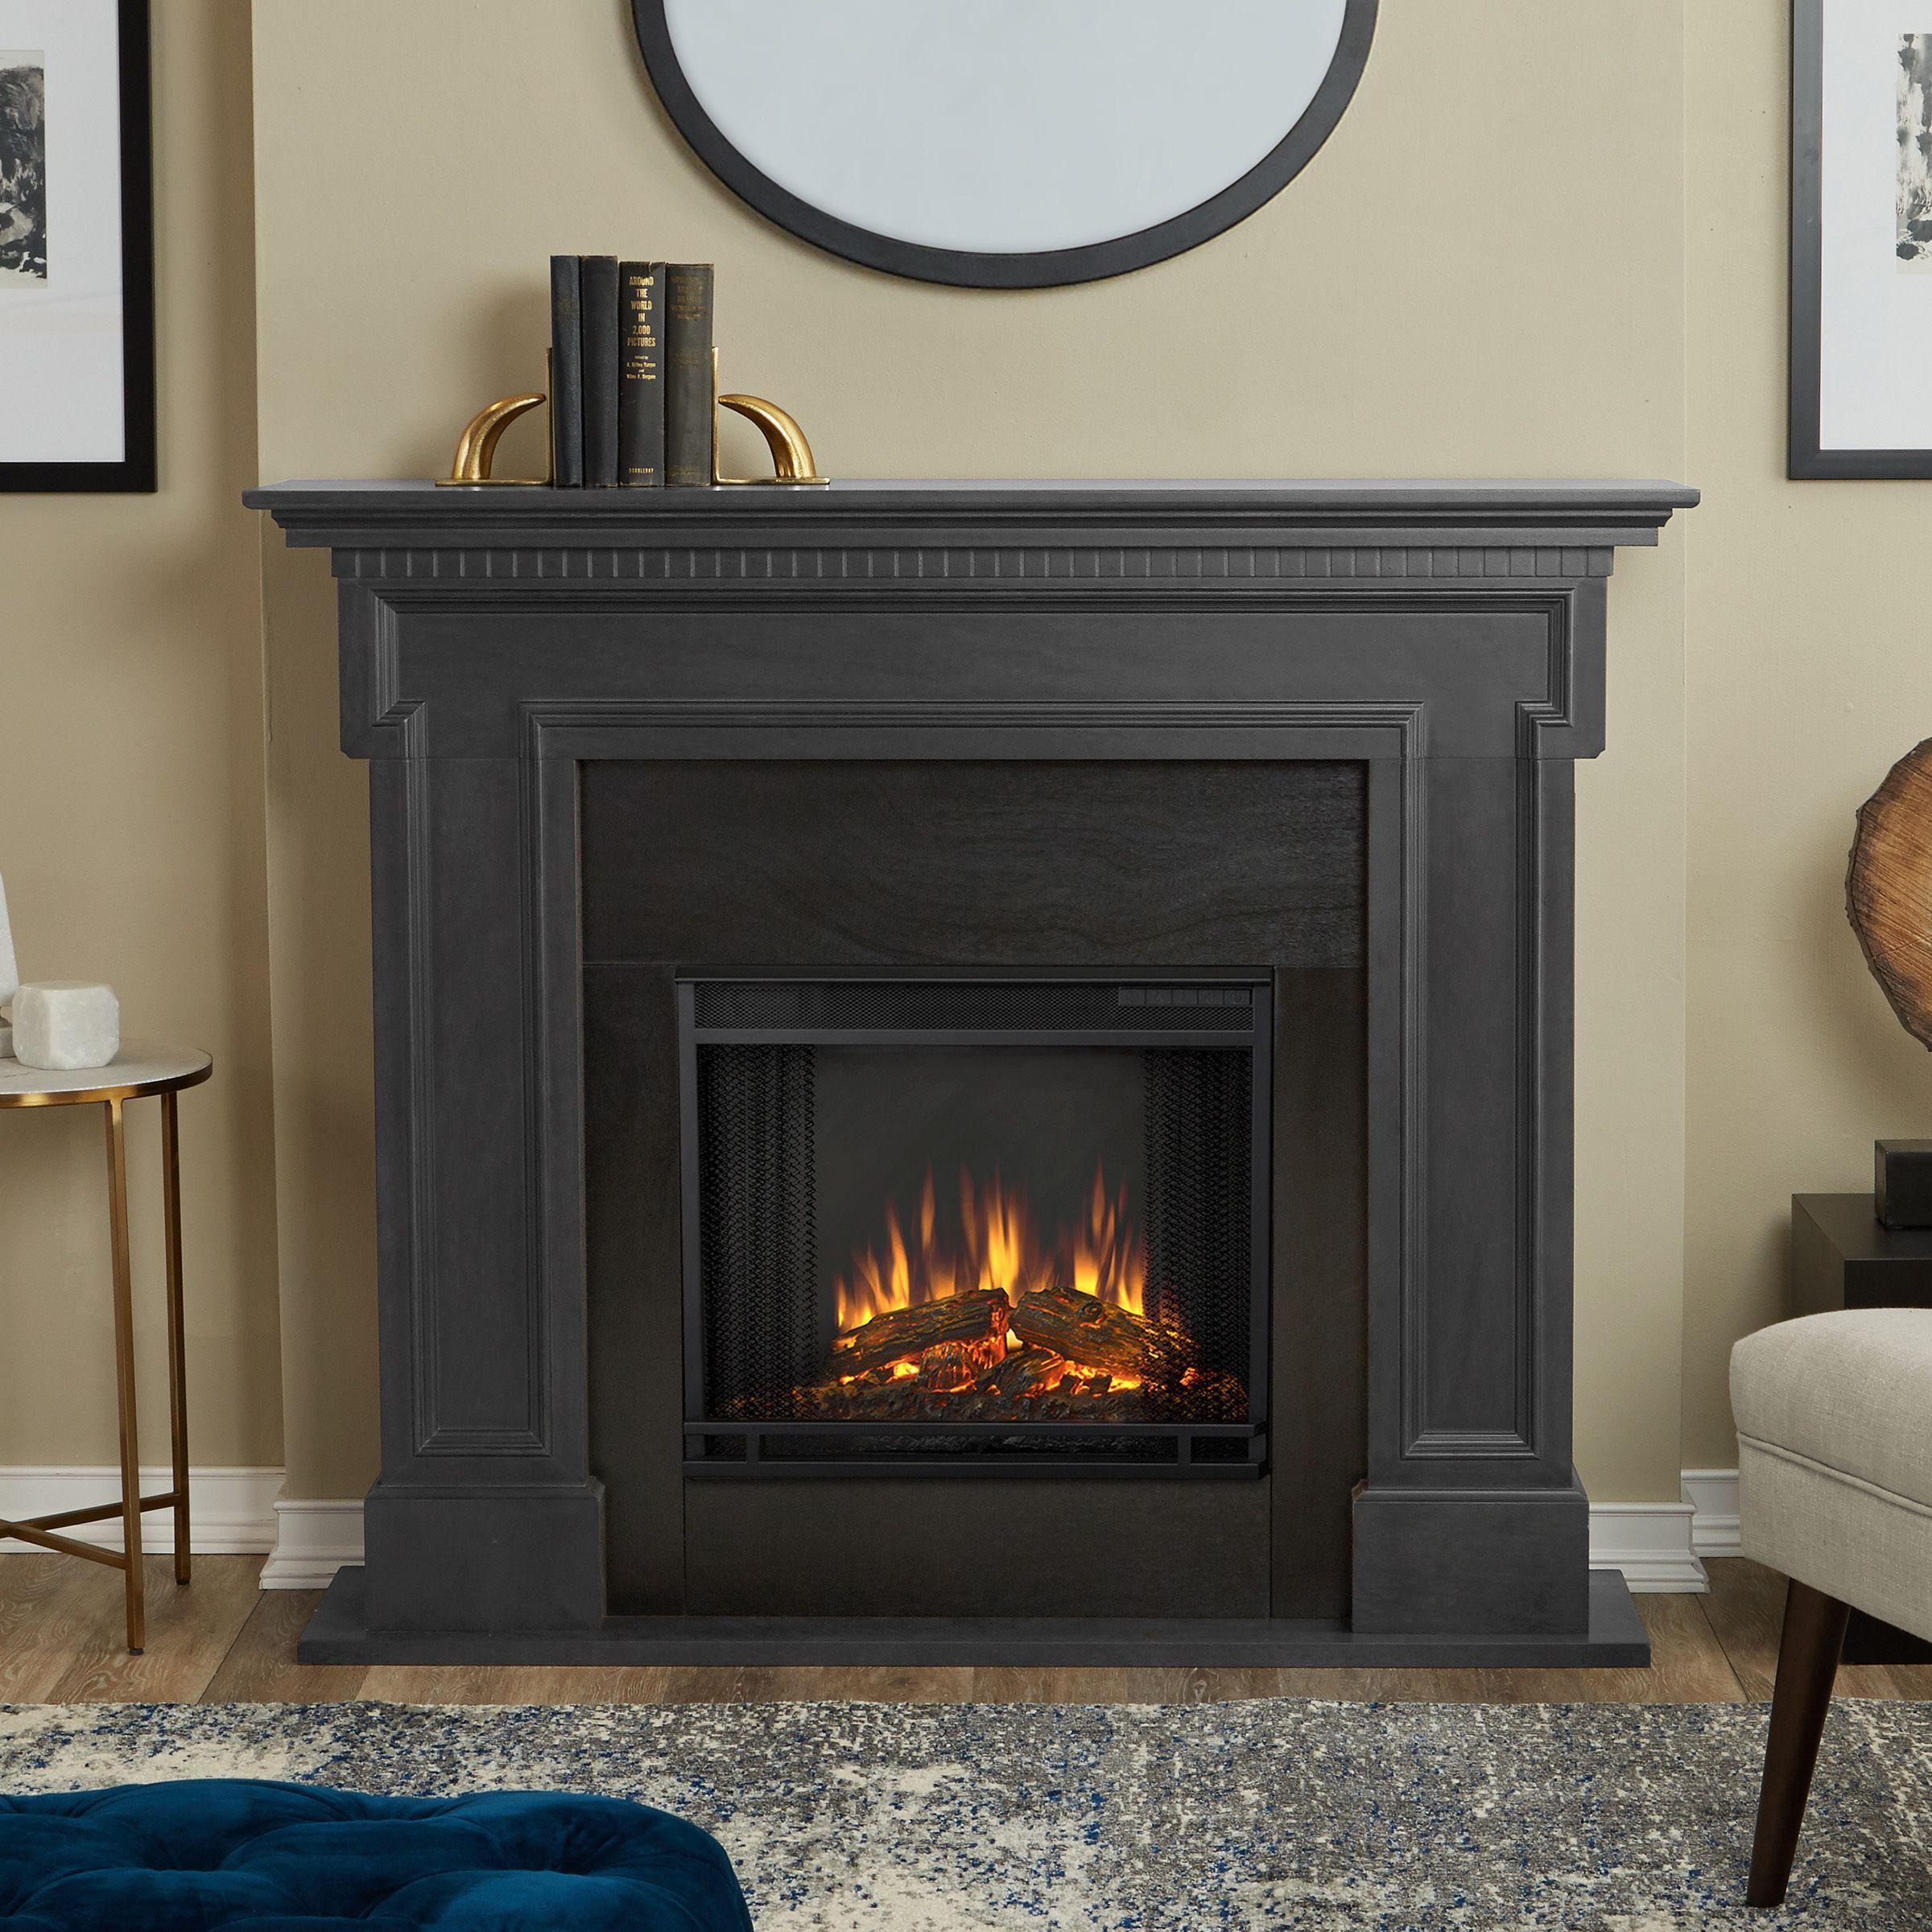 fireplace ideas fireplace mantel ideas outdoor fireplace ideas